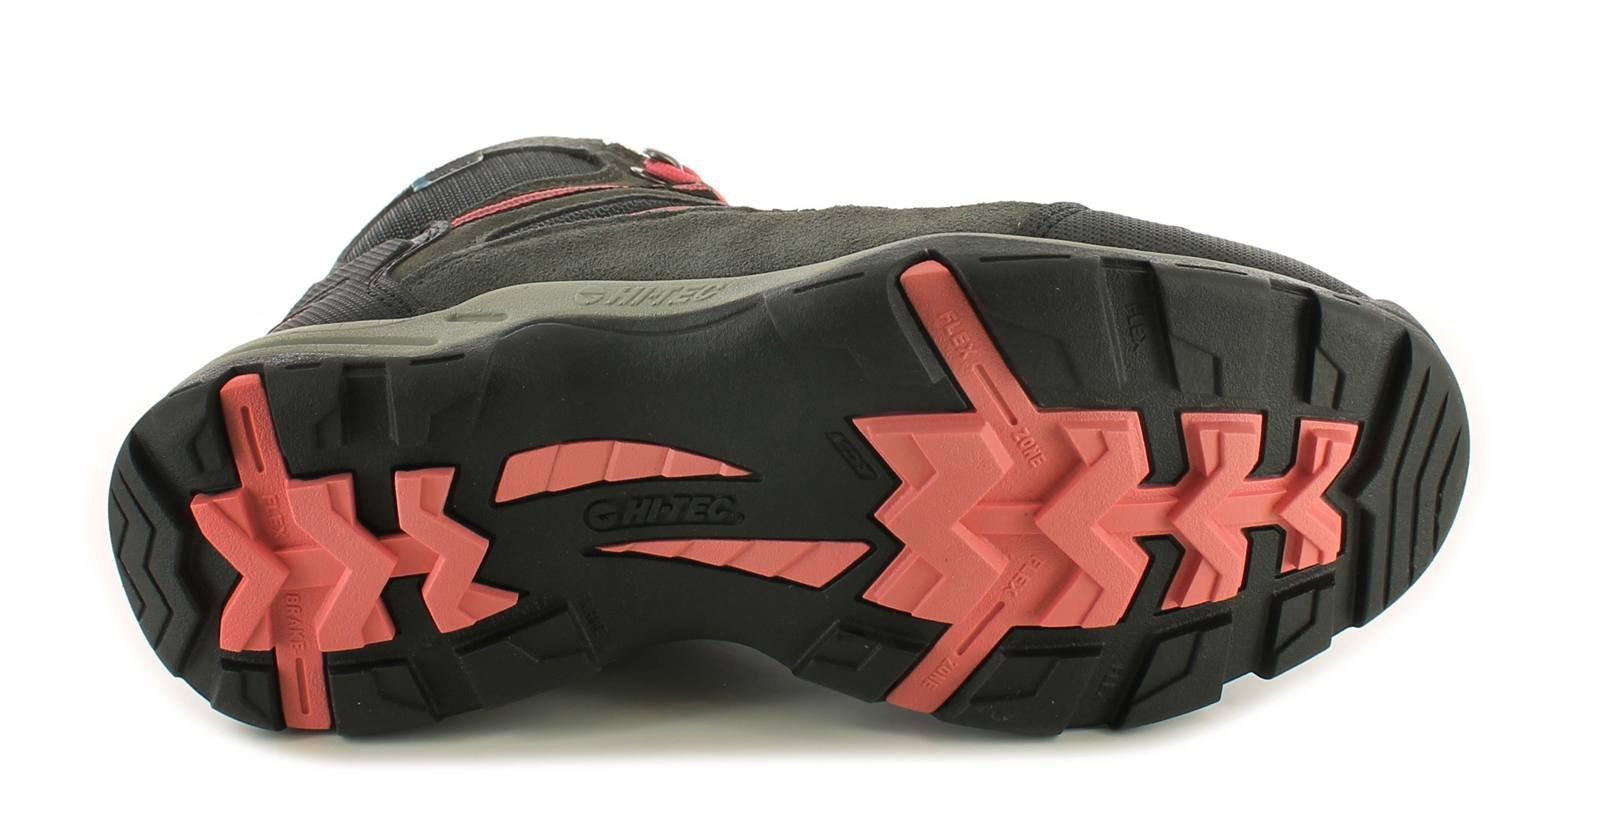 61gkNkfSsYL - Hi-Tec Bandera II Mid WP Women's Walking Shoes